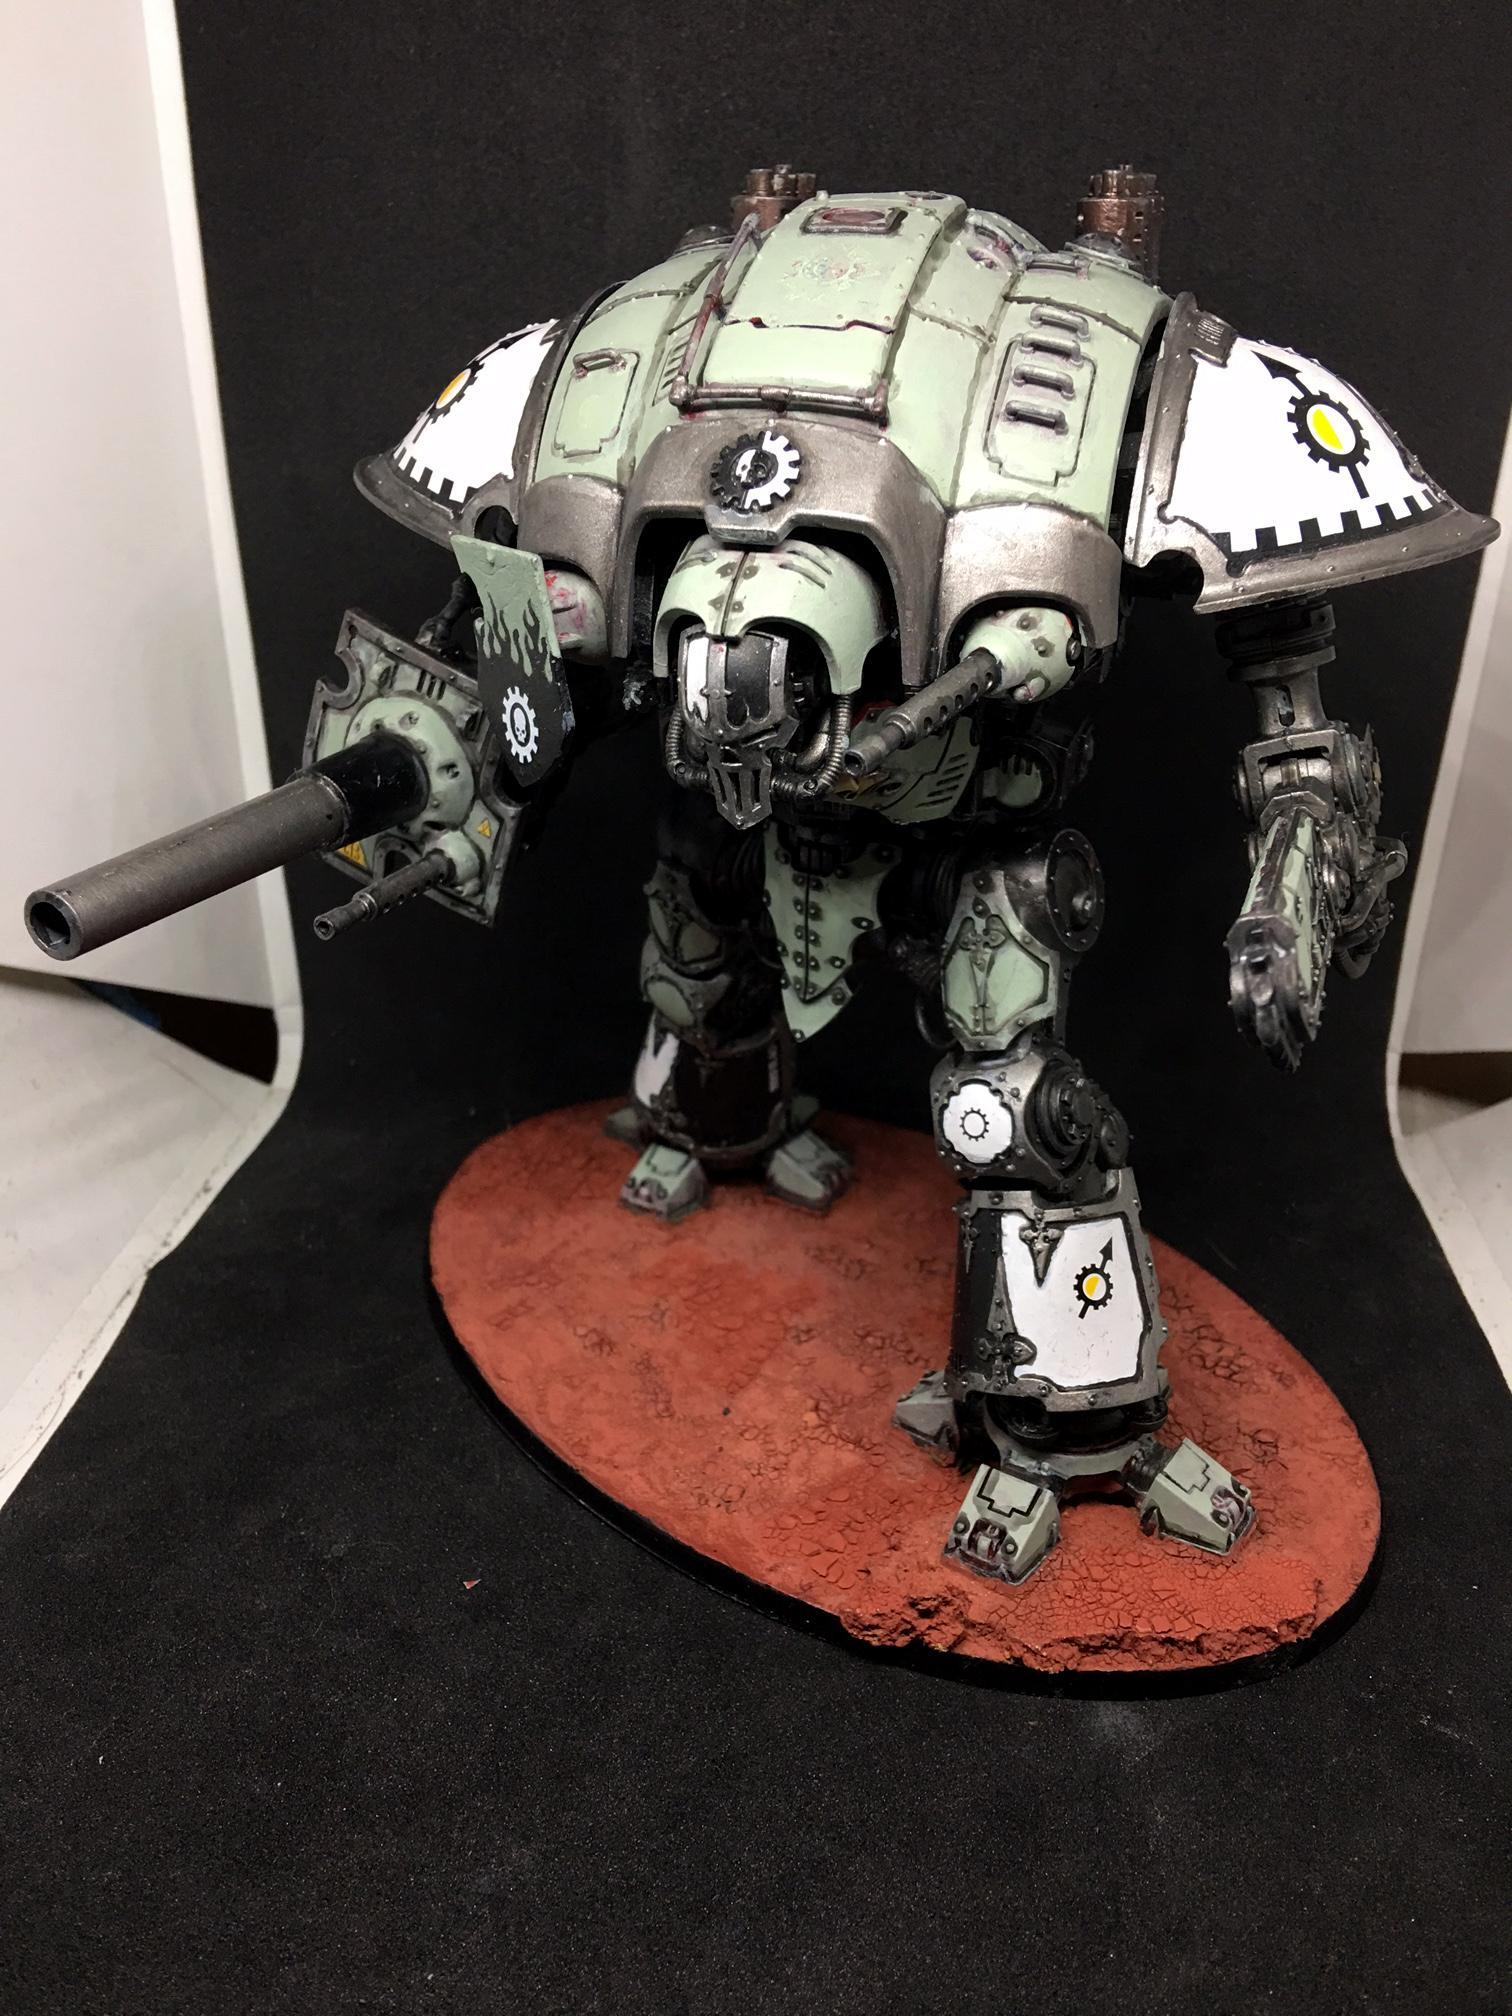 Admech, Imperial Knight, Mars, Mechanicus, Phobos, Warhammer 40,000